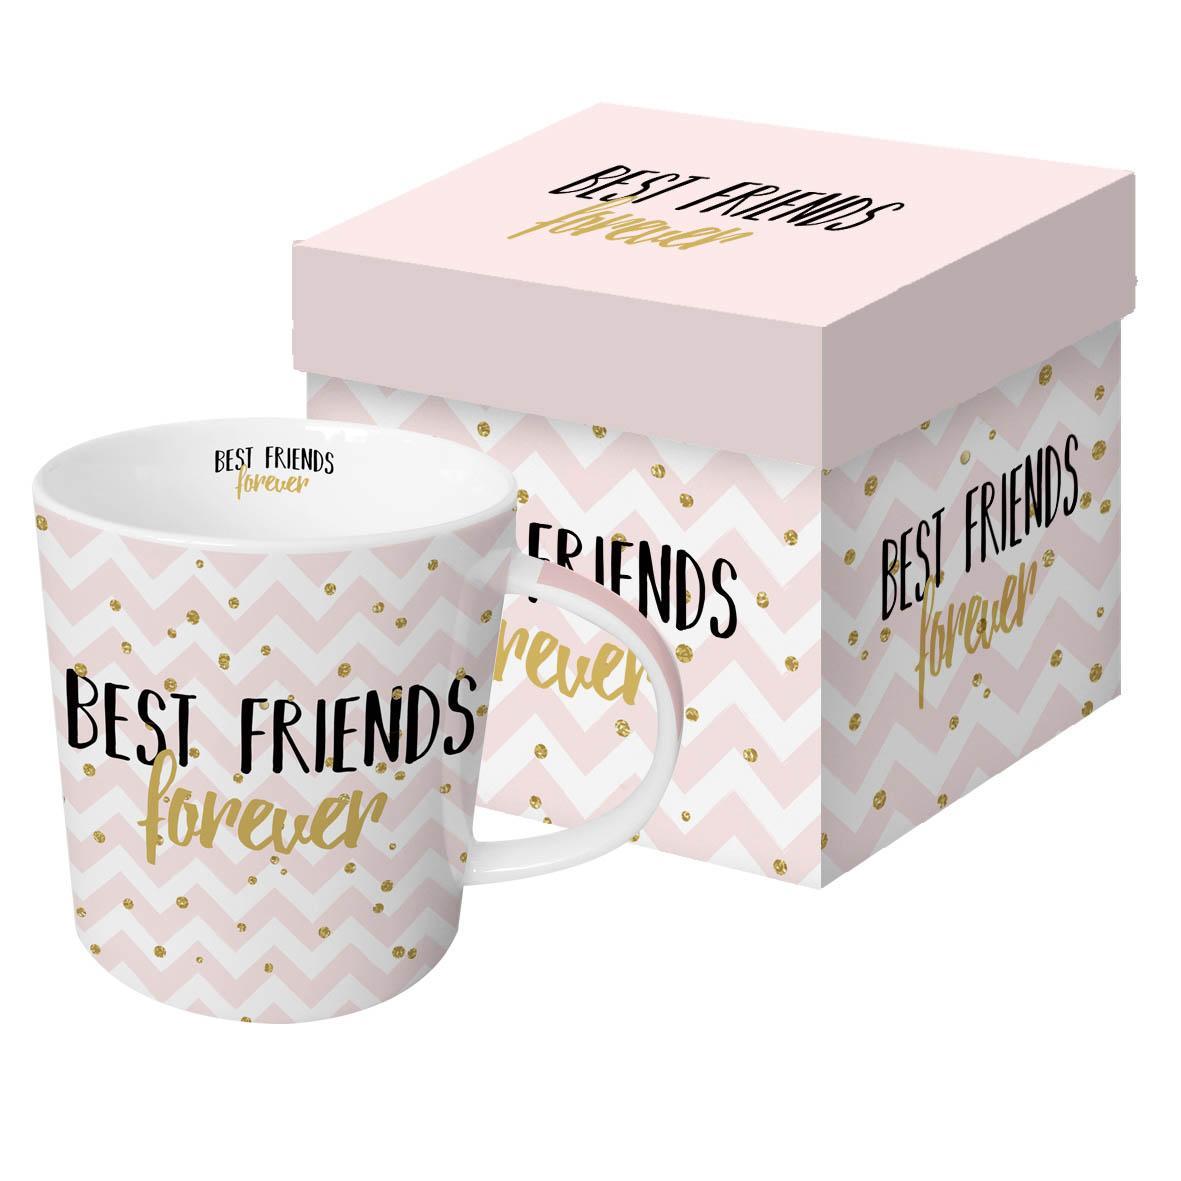 Šolja u poklon kutiji FOREVER FRIENDS